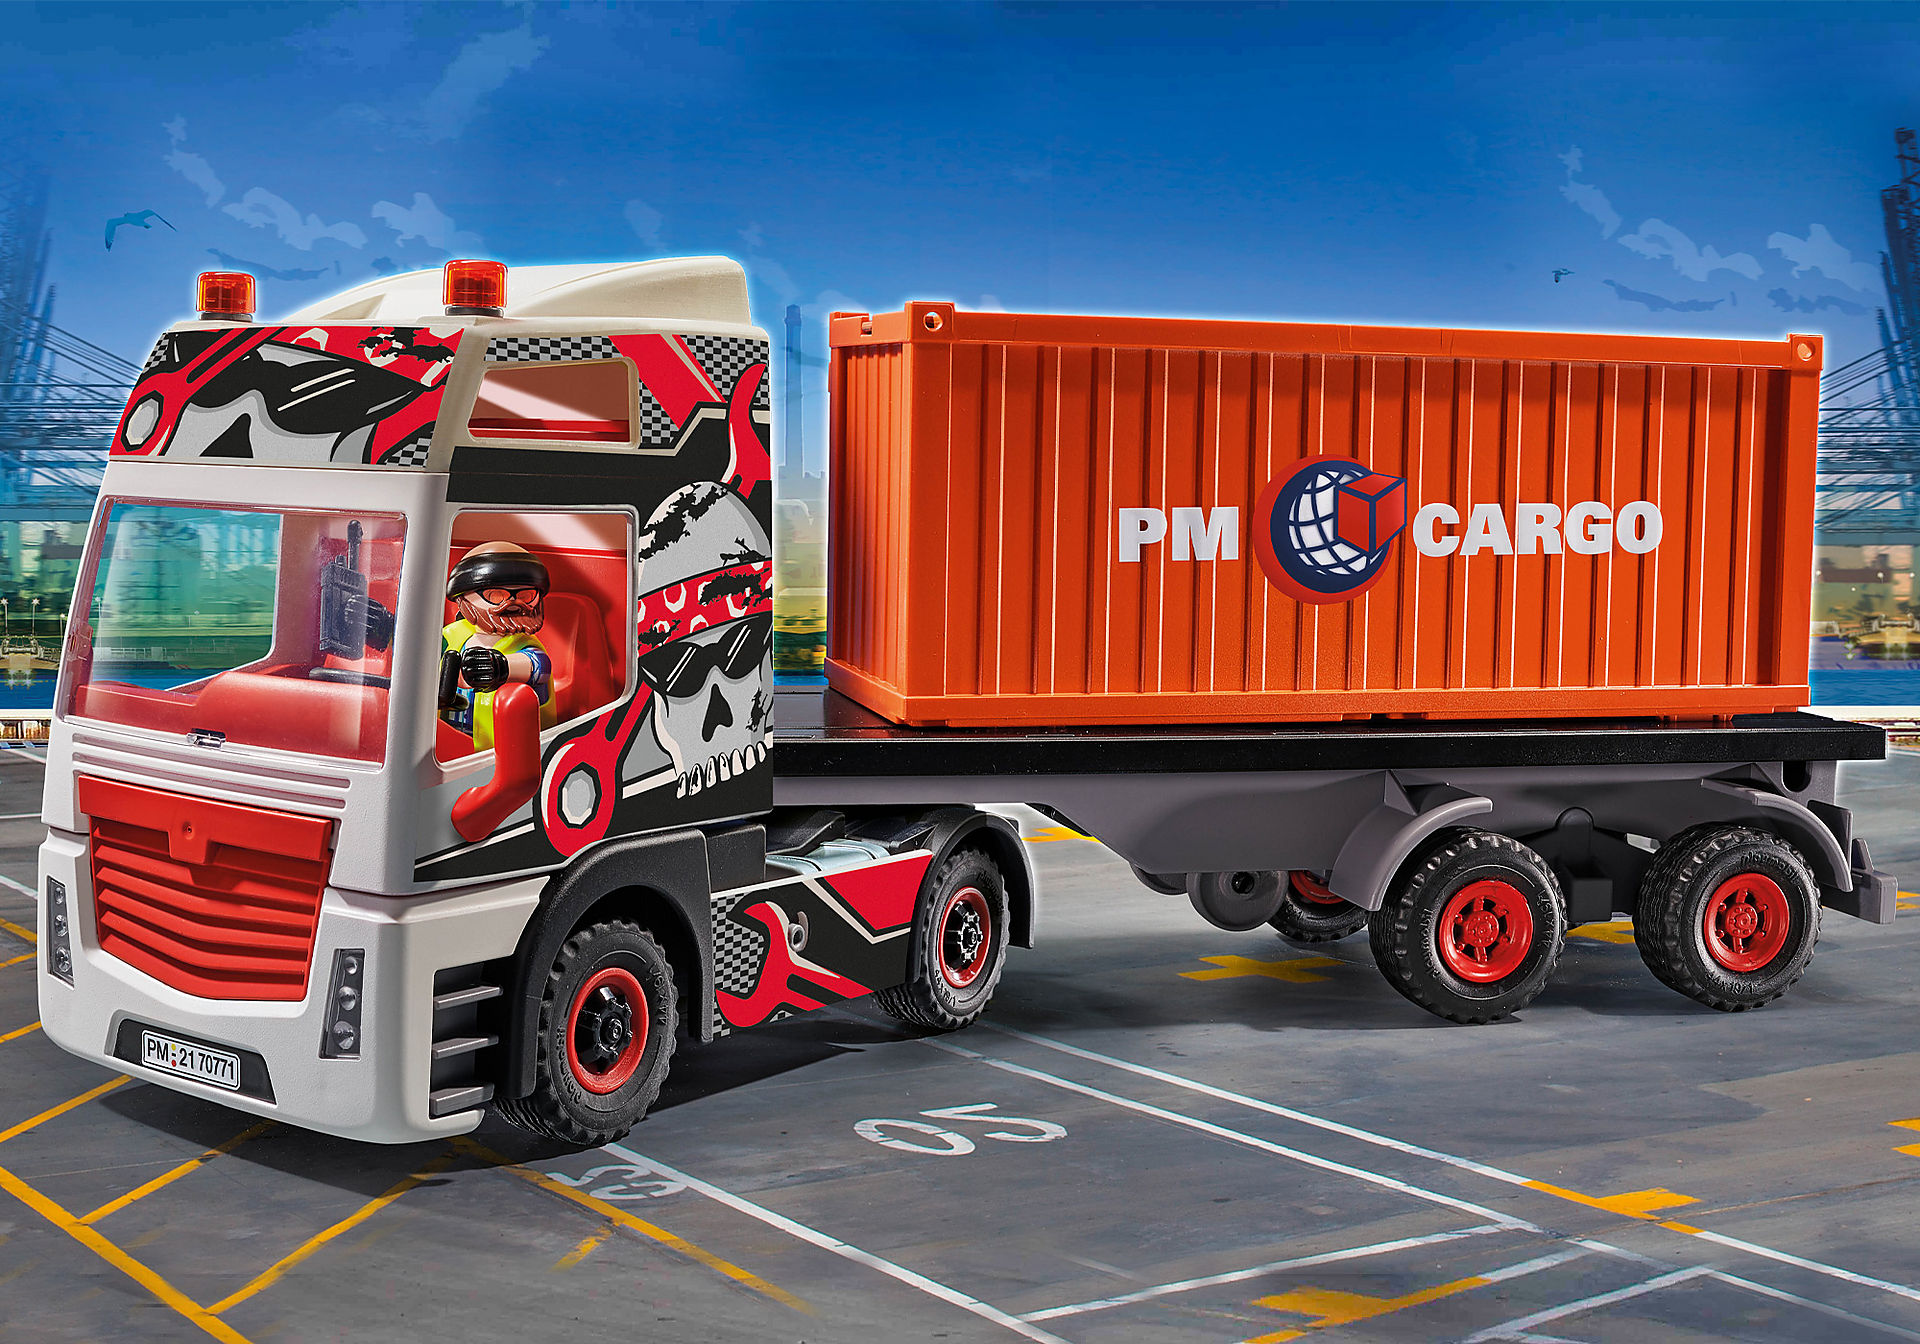 70771 Lastbil med lastcontainer zoom image1